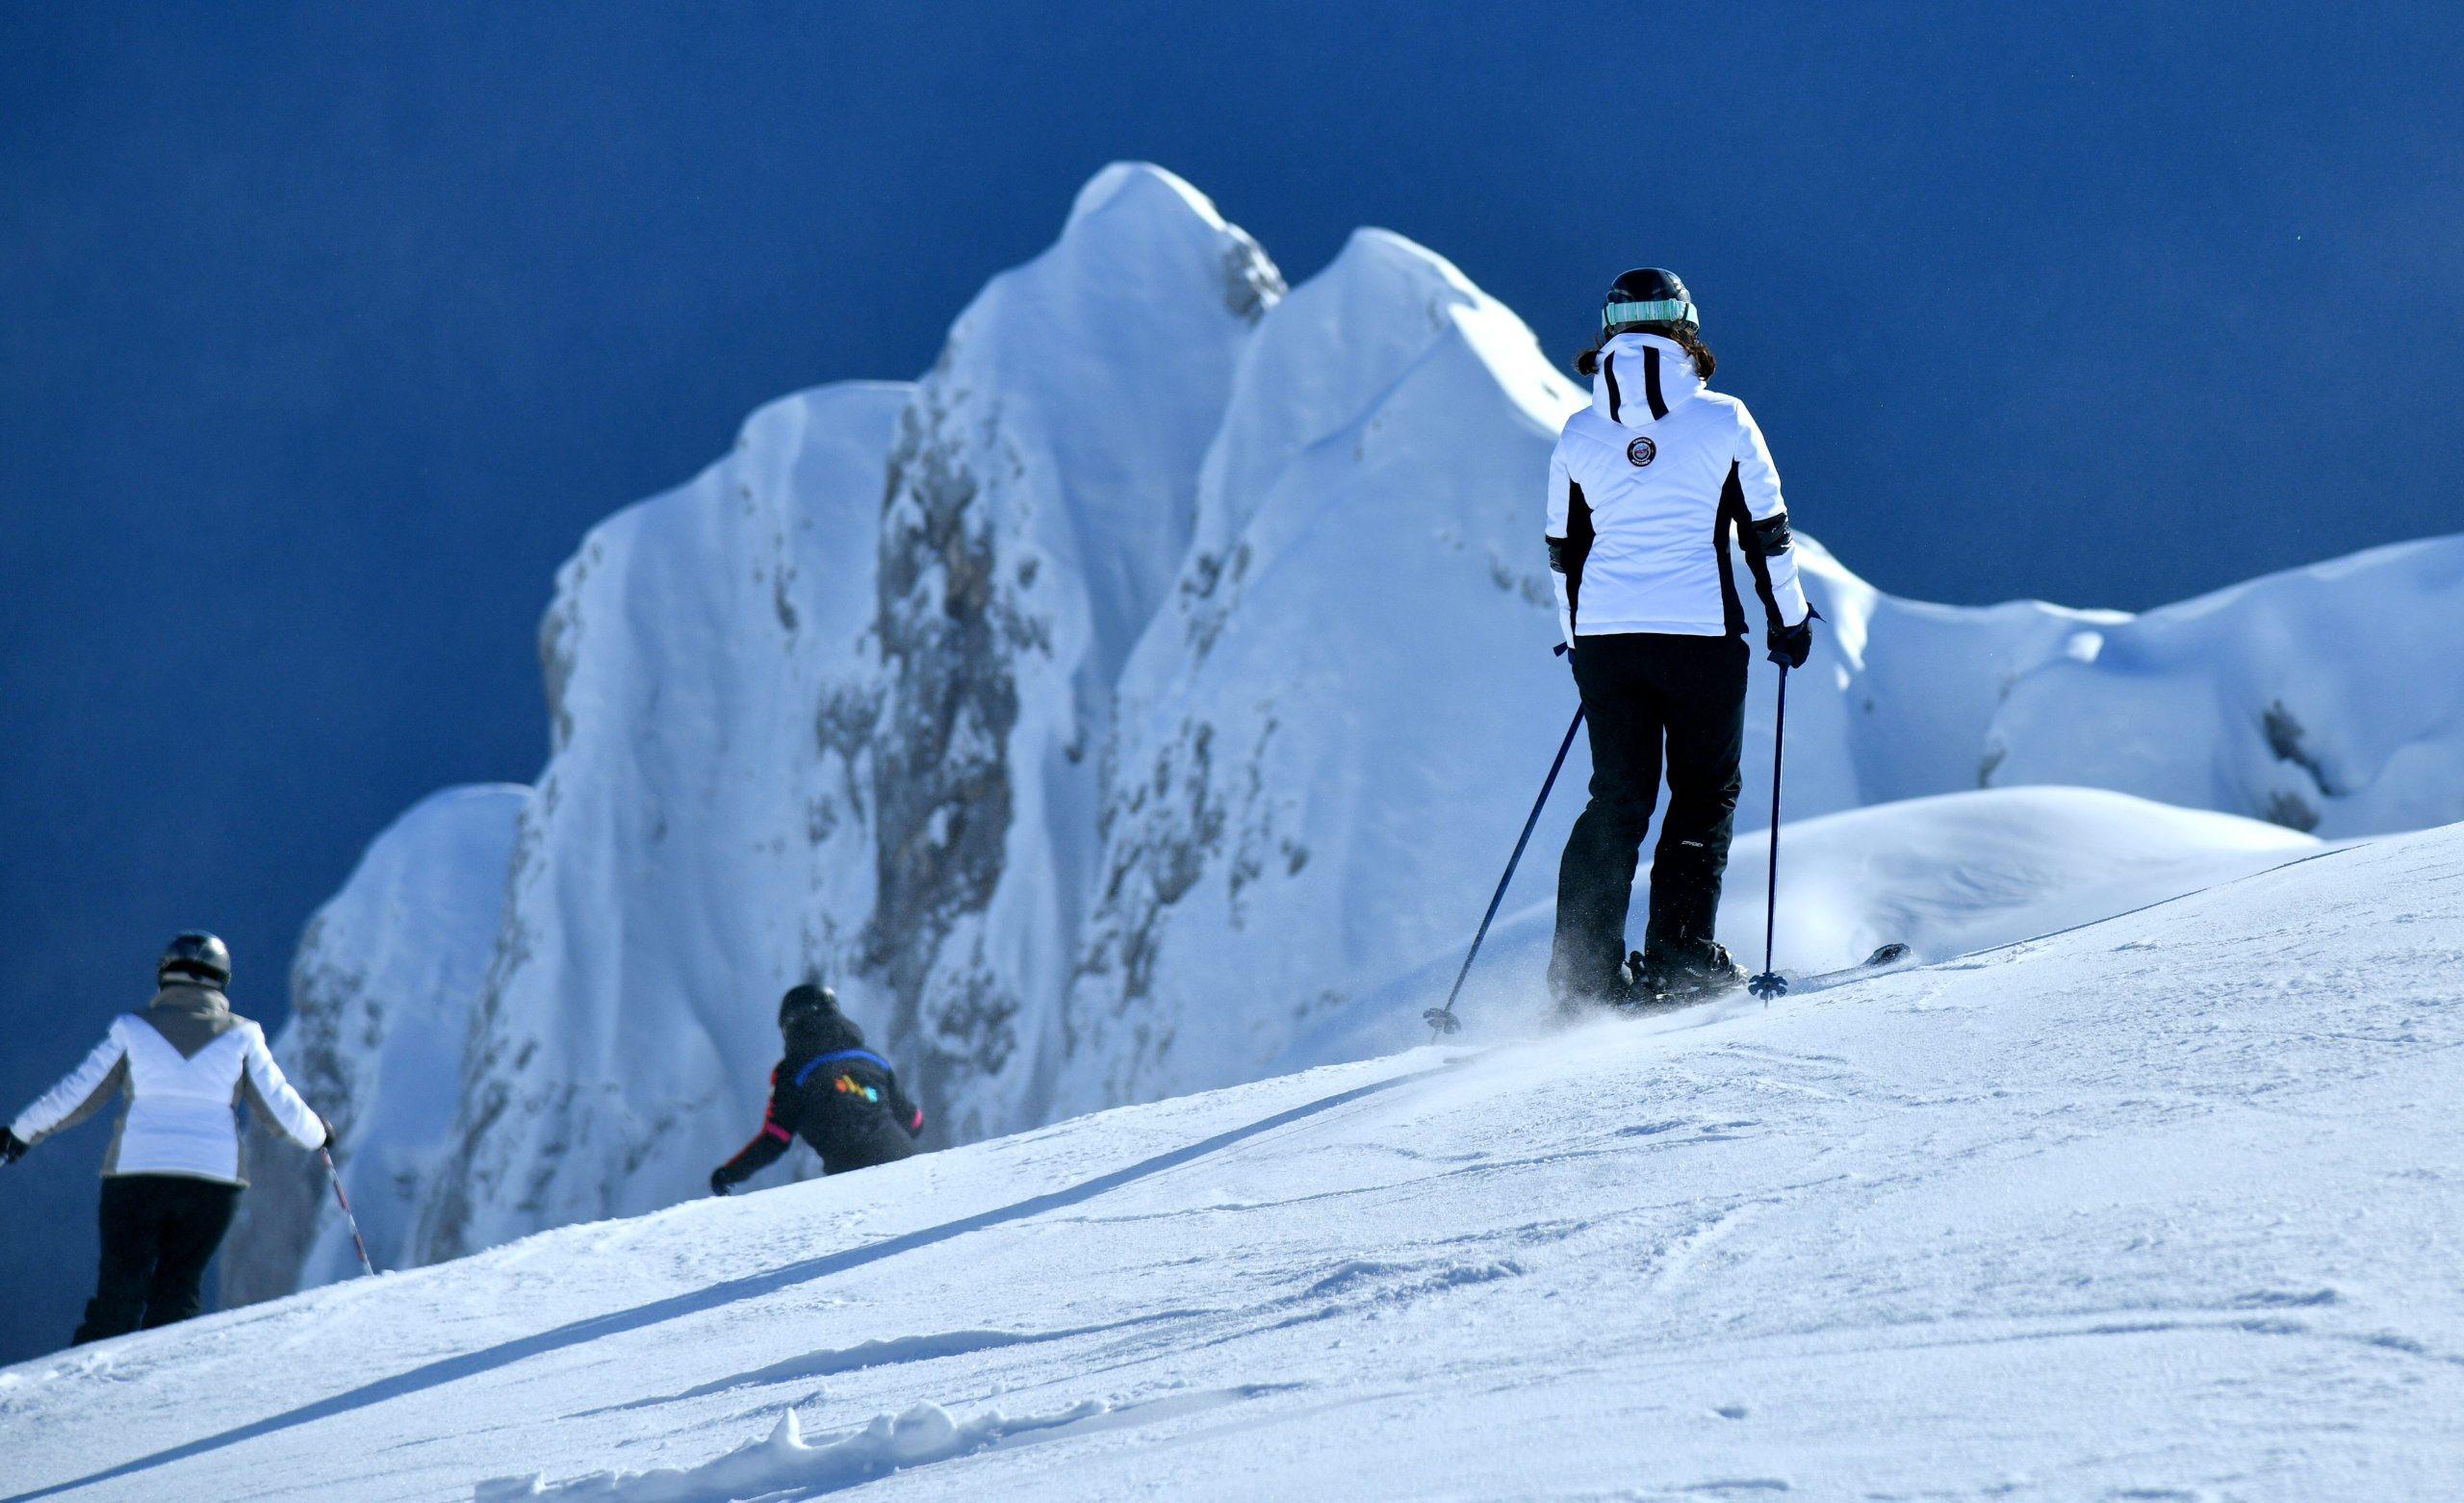 ski_patrola21-020120_1